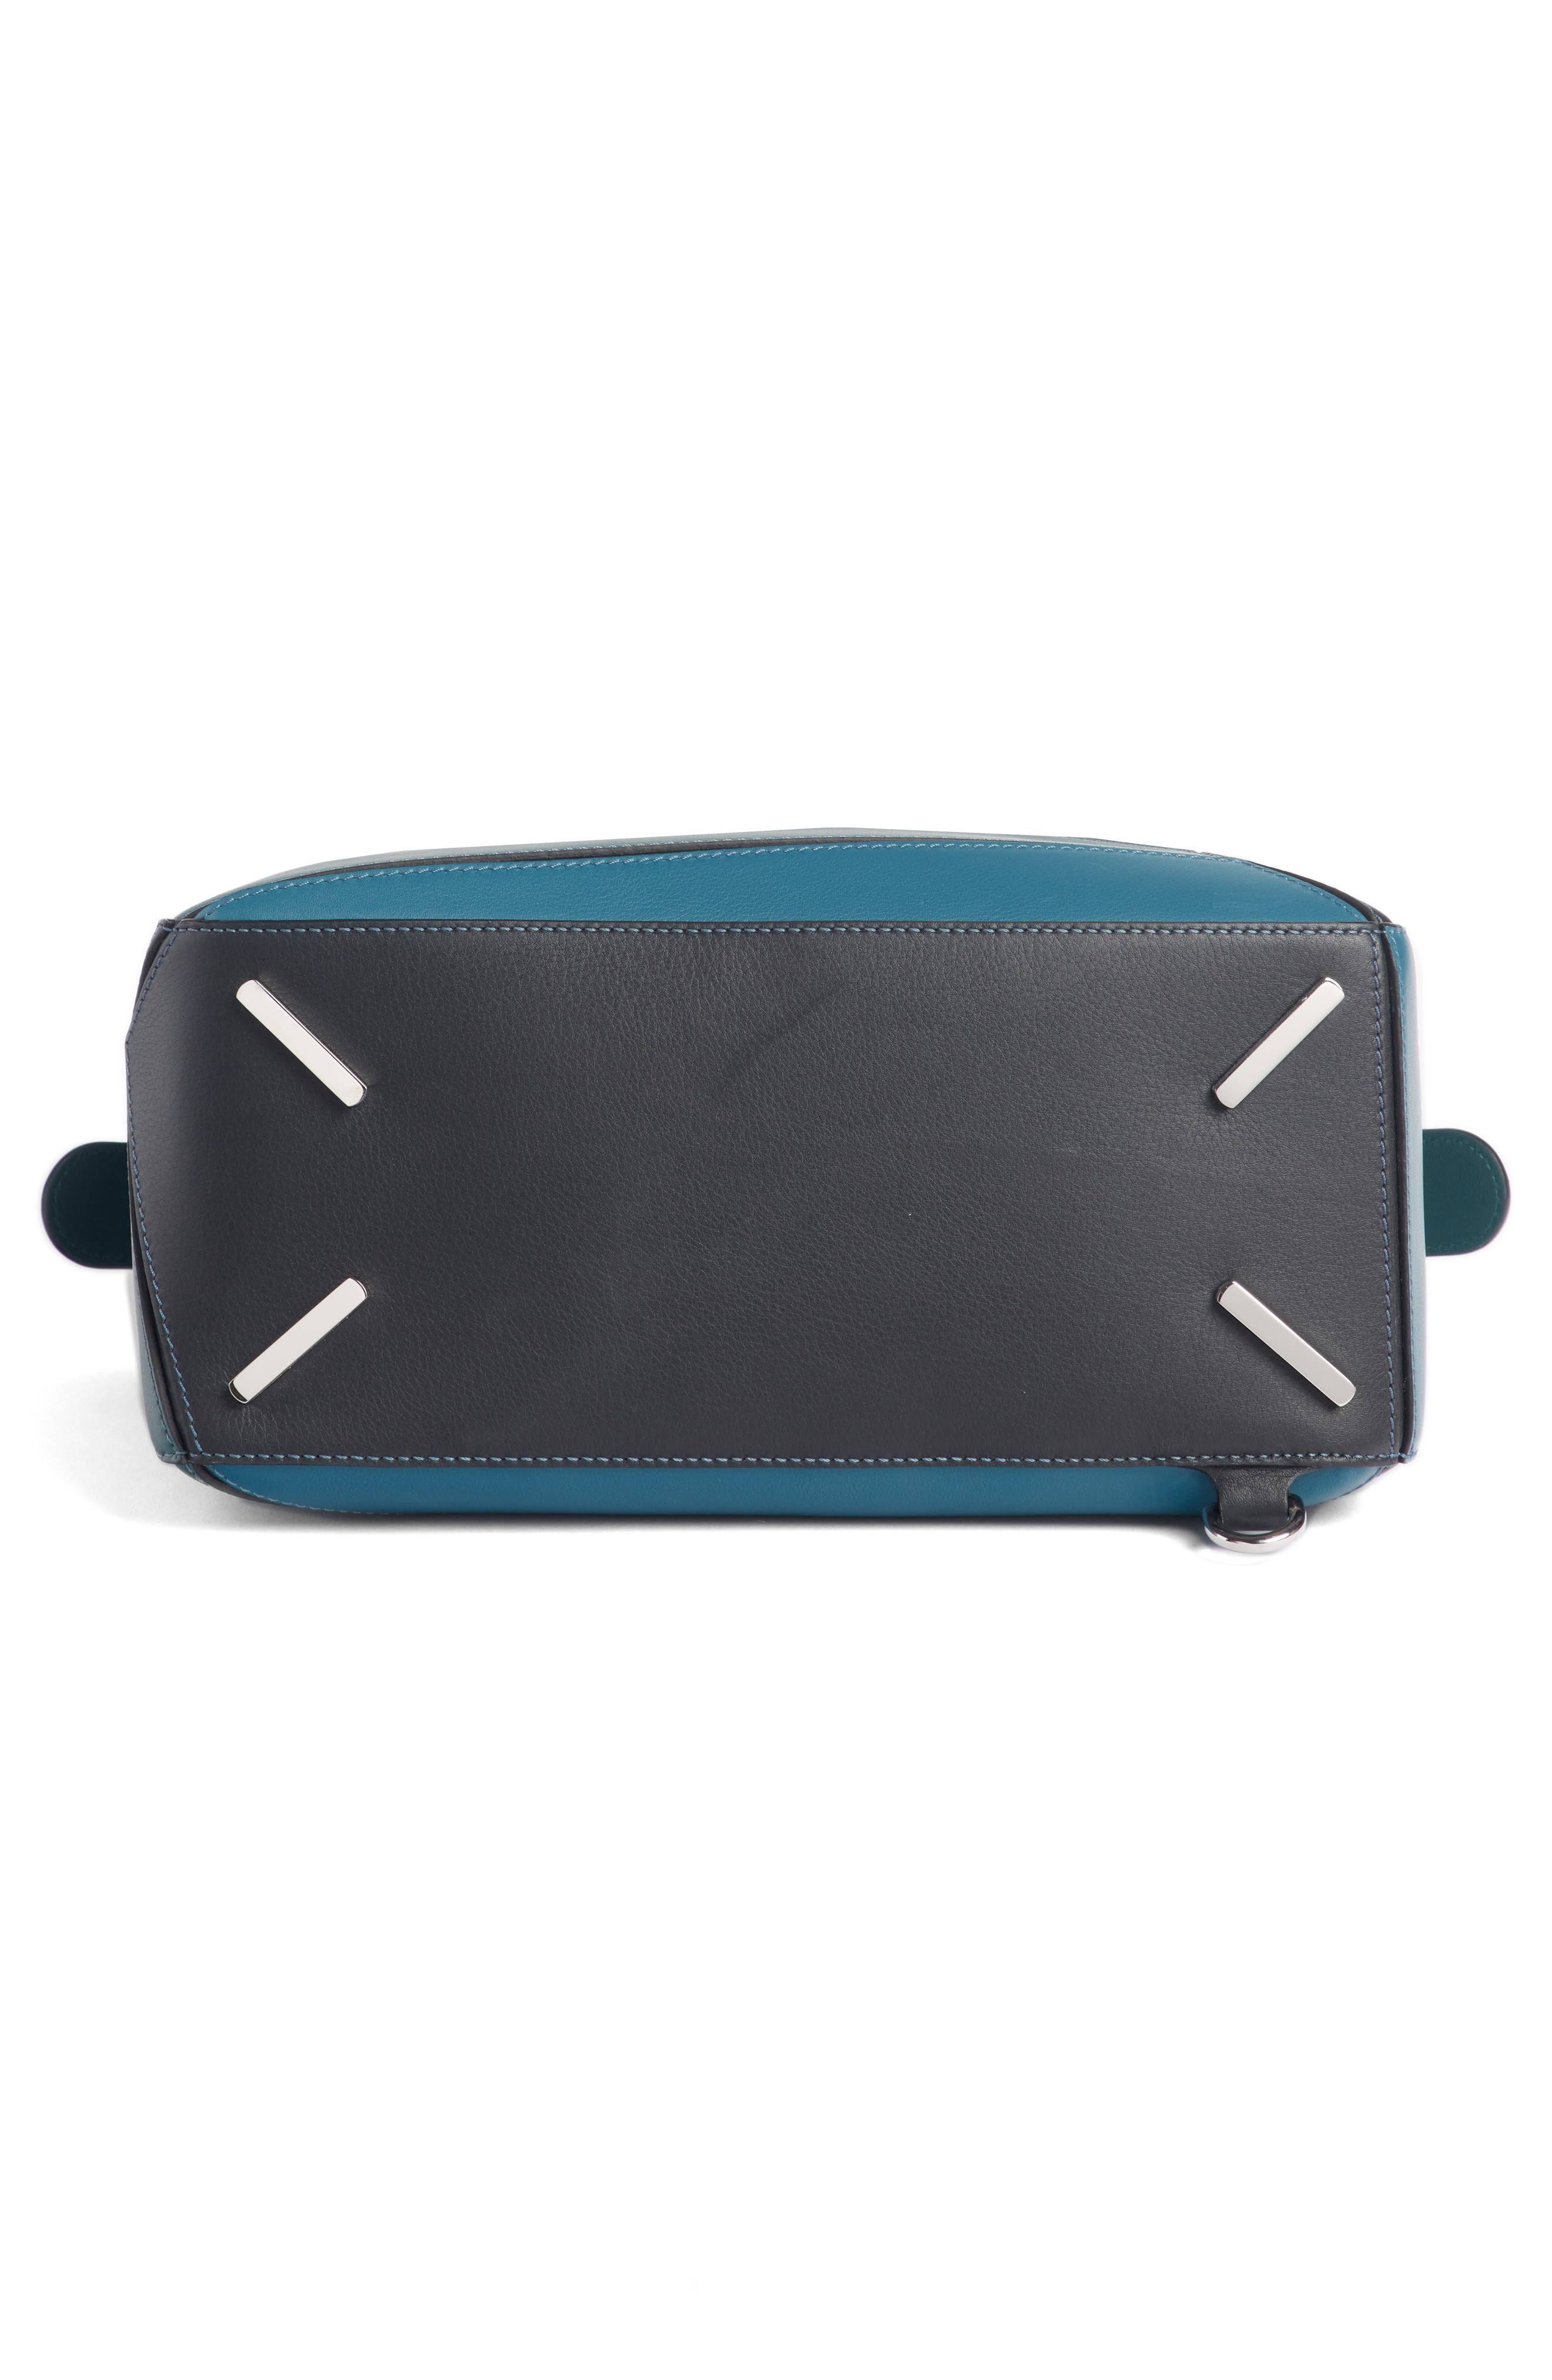 Medium Puzzle Calfskin Leather Shoulder Bag,                             Alternate thumbnail 5, color,                             PETROLEUM BLUE/ CYPRESS